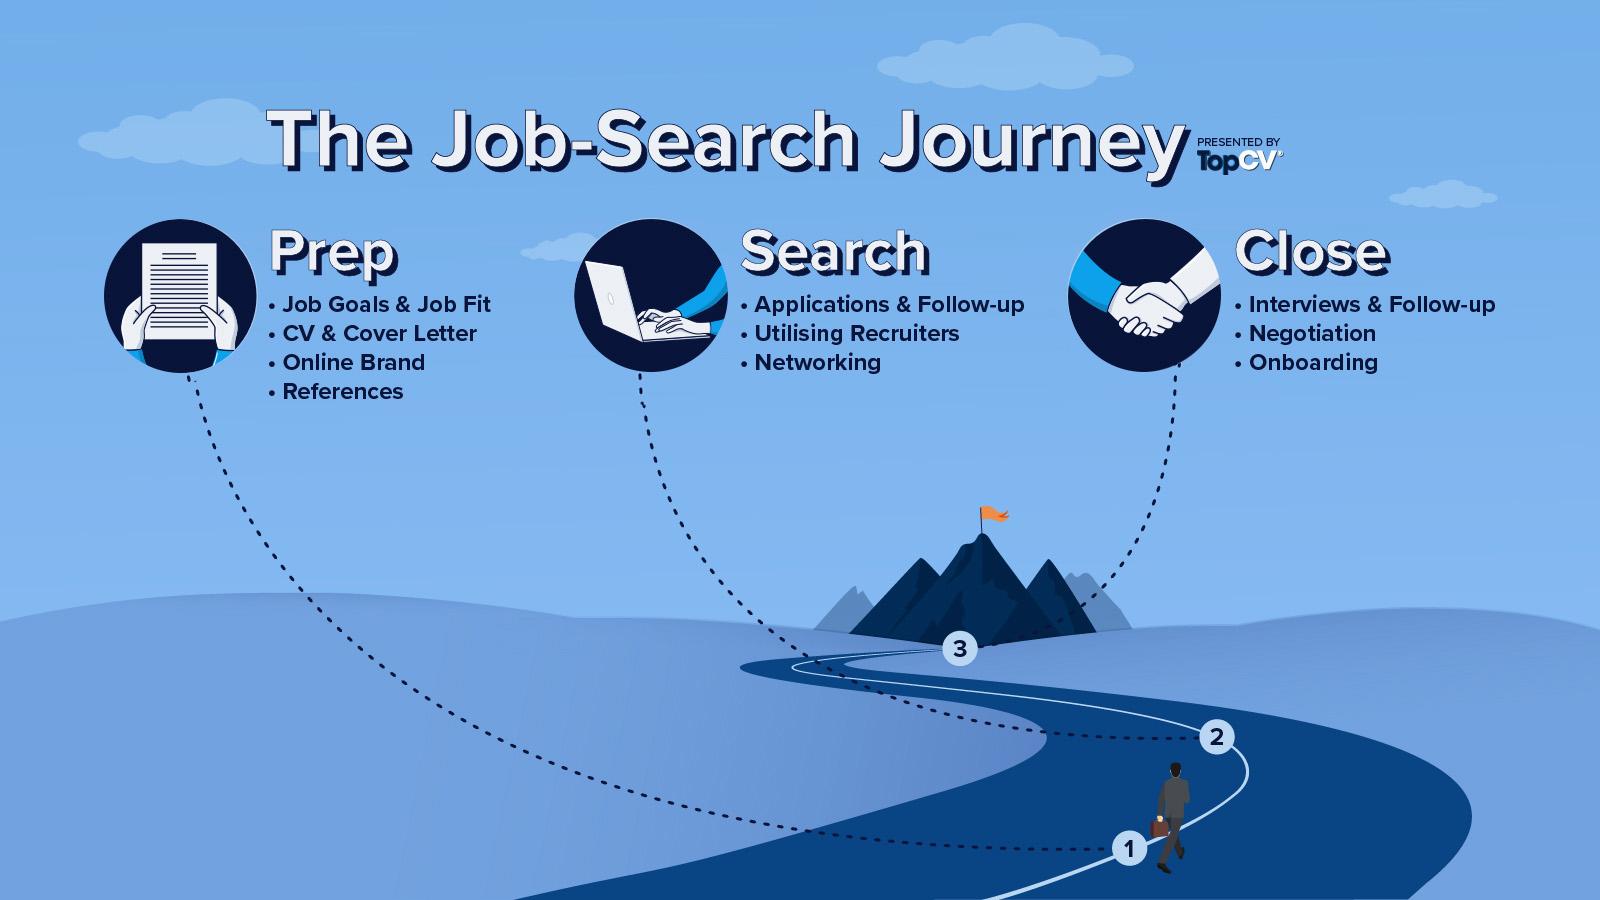 TopCV job search journey